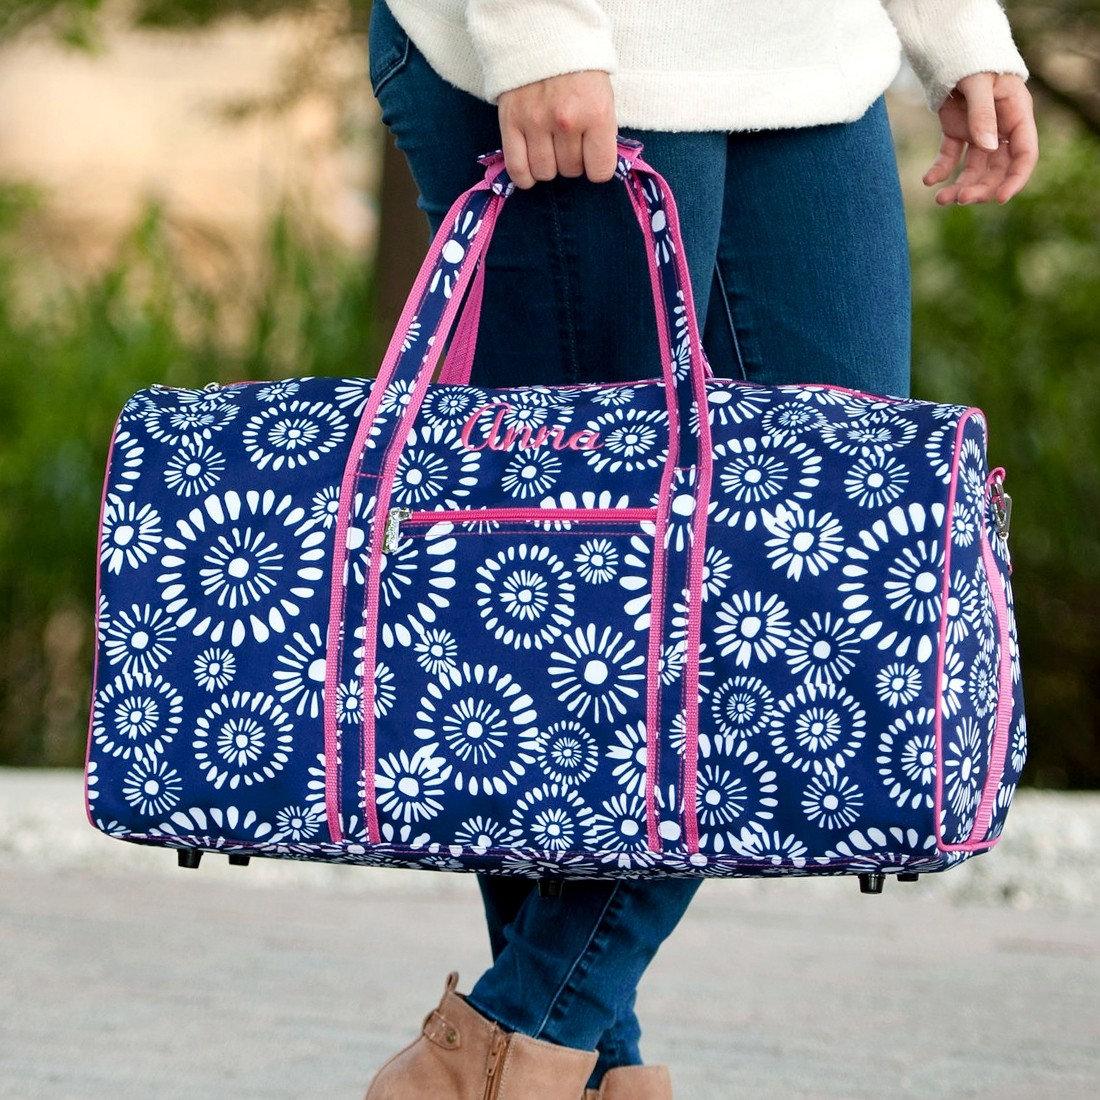 Riley Monogrammed Duffel Bag, Personalized Bag 7319ad1f66